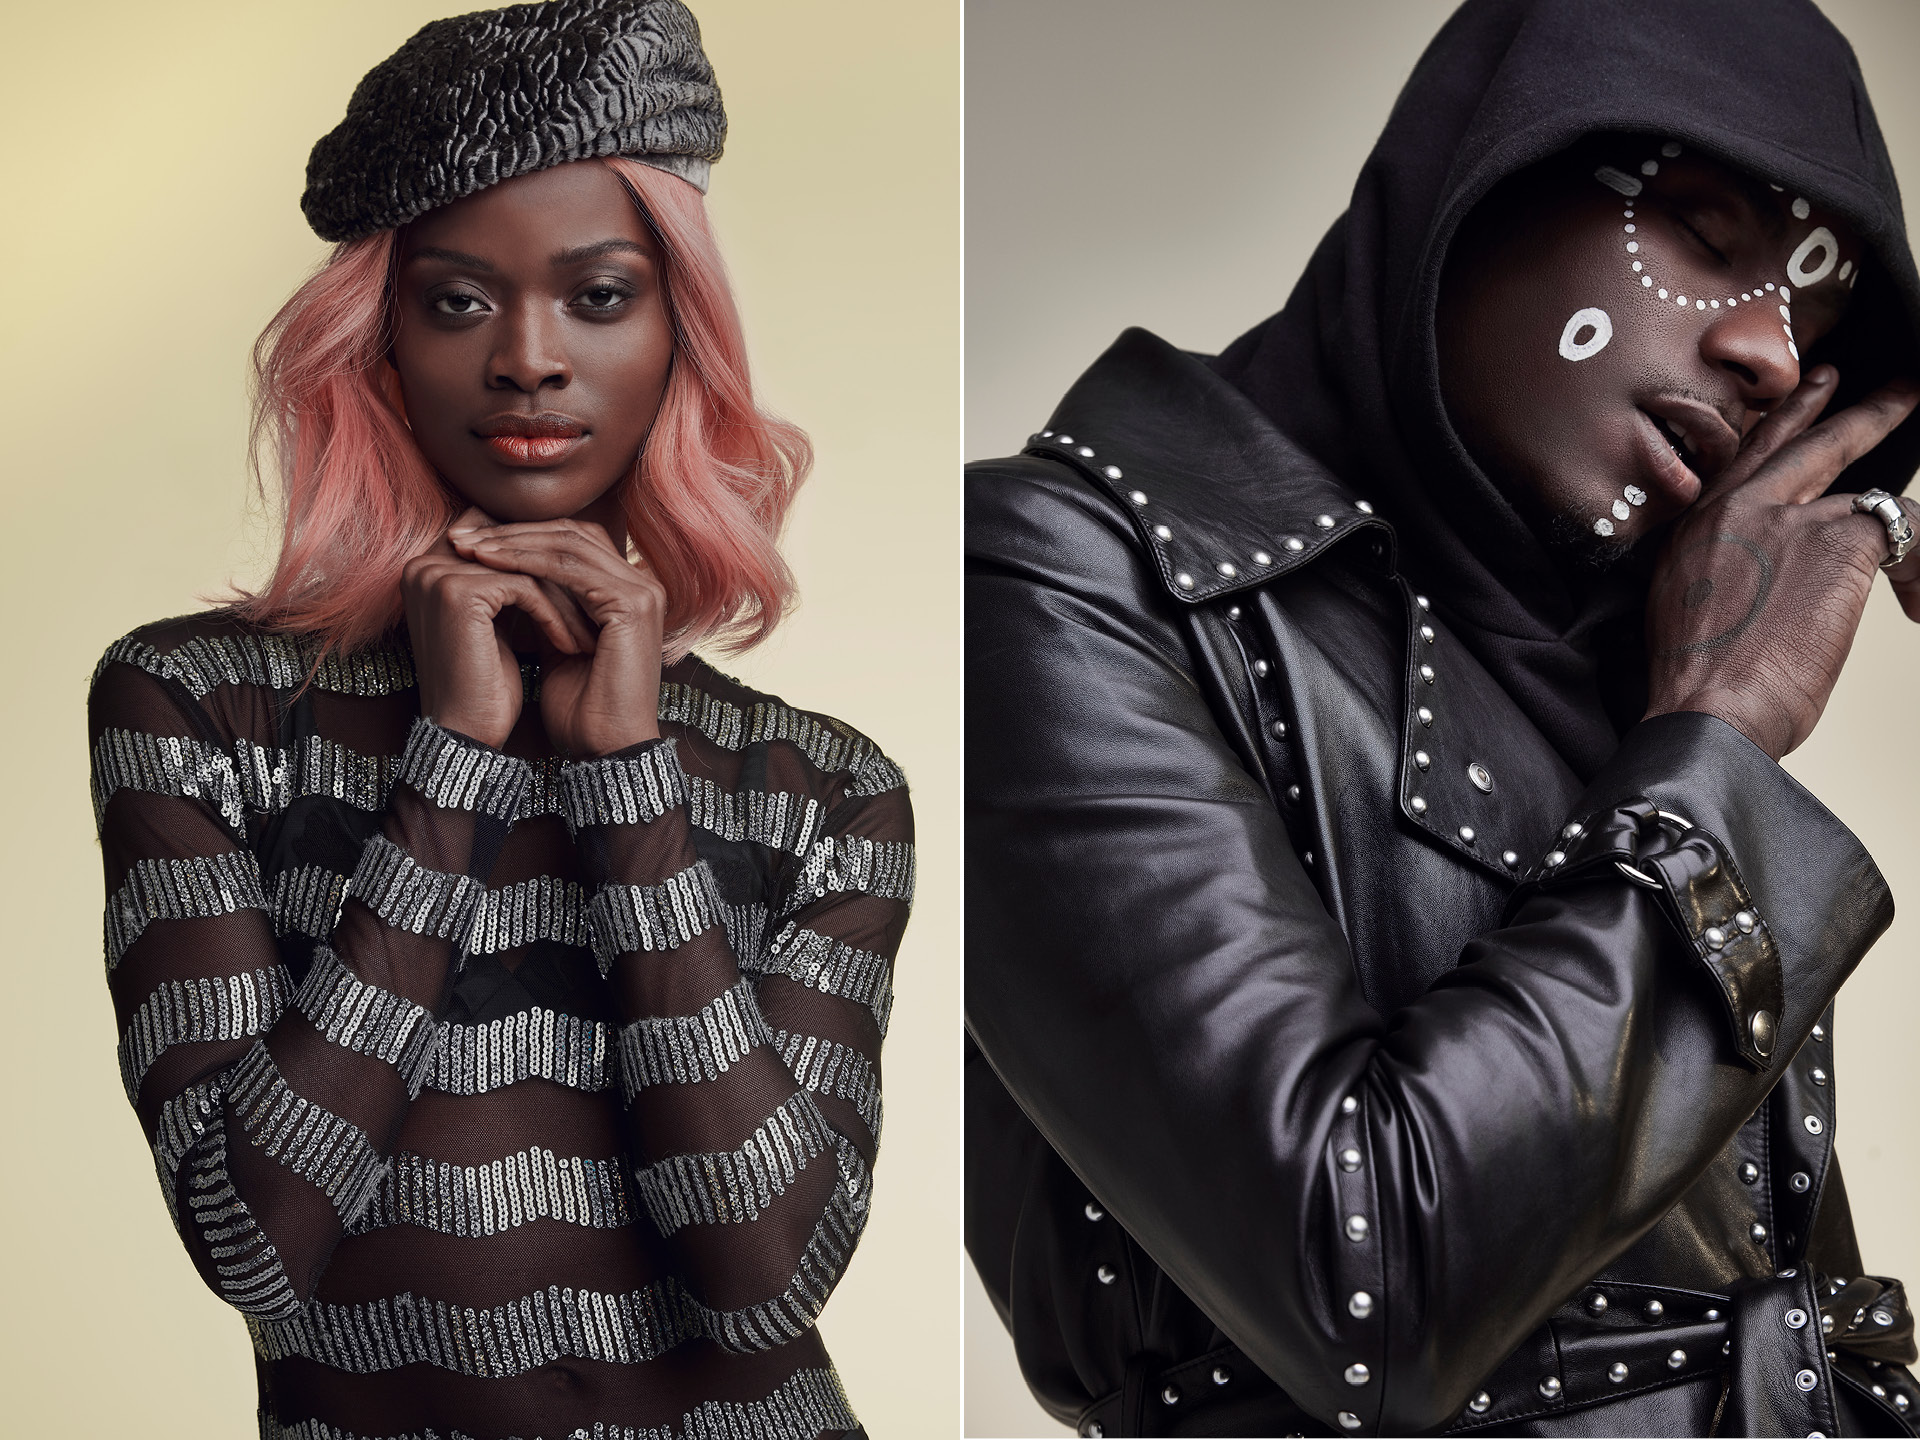 Spirit-&-Flesh-Magazine_YOUNG-PARIS_&_WEMI-AHUNAMBA_by_MINH NGUYEN_3